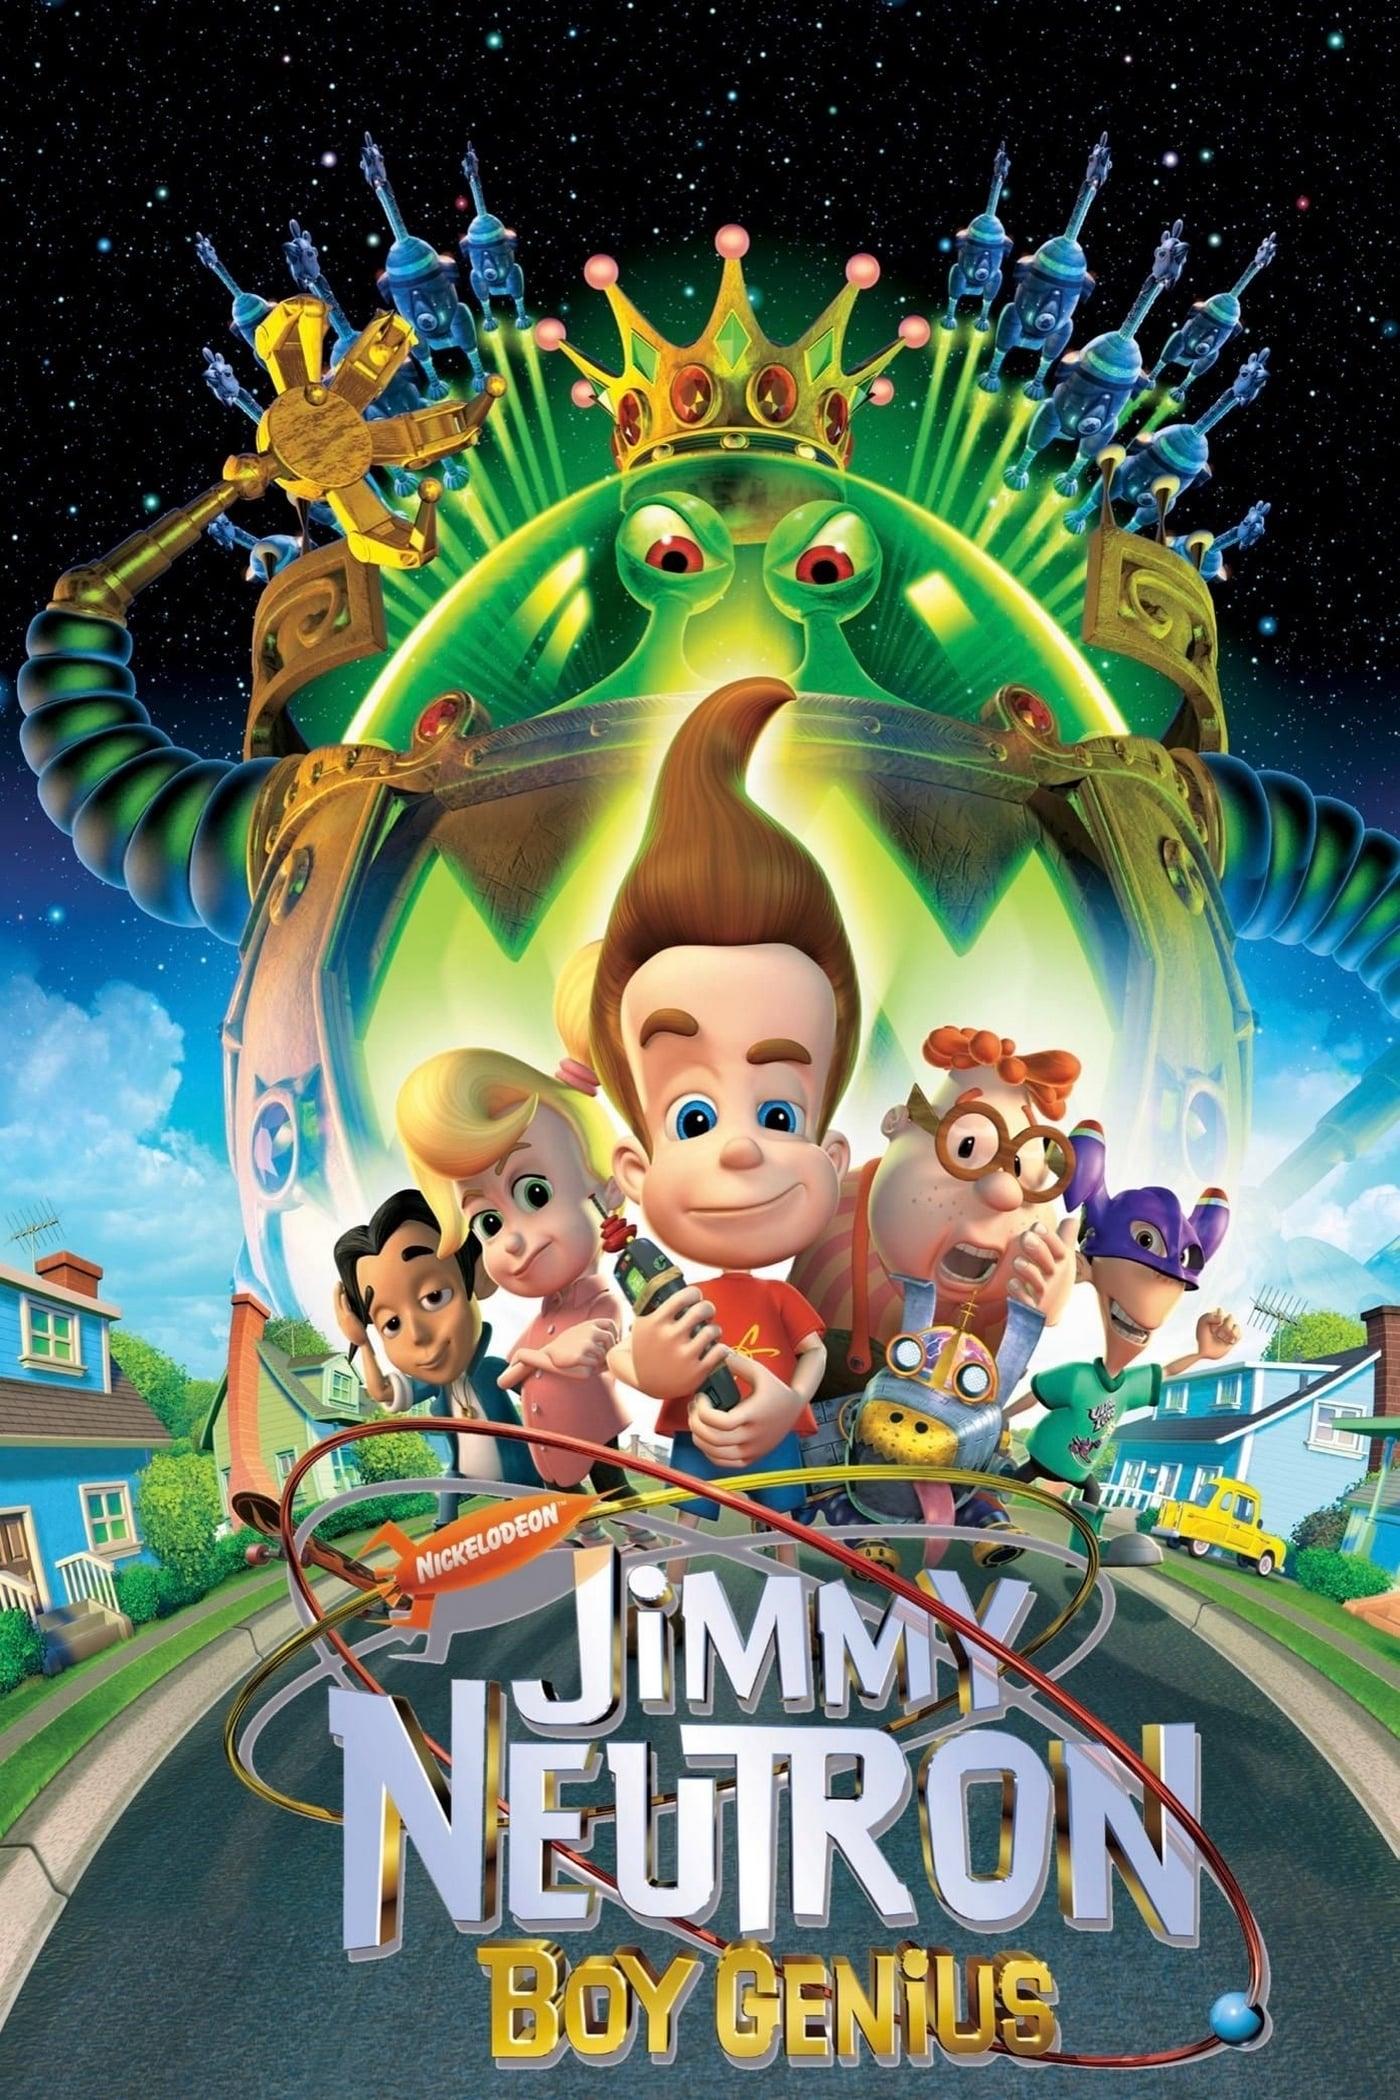 Jimmy Neutron Boy Genius 2001 Posters The Movie